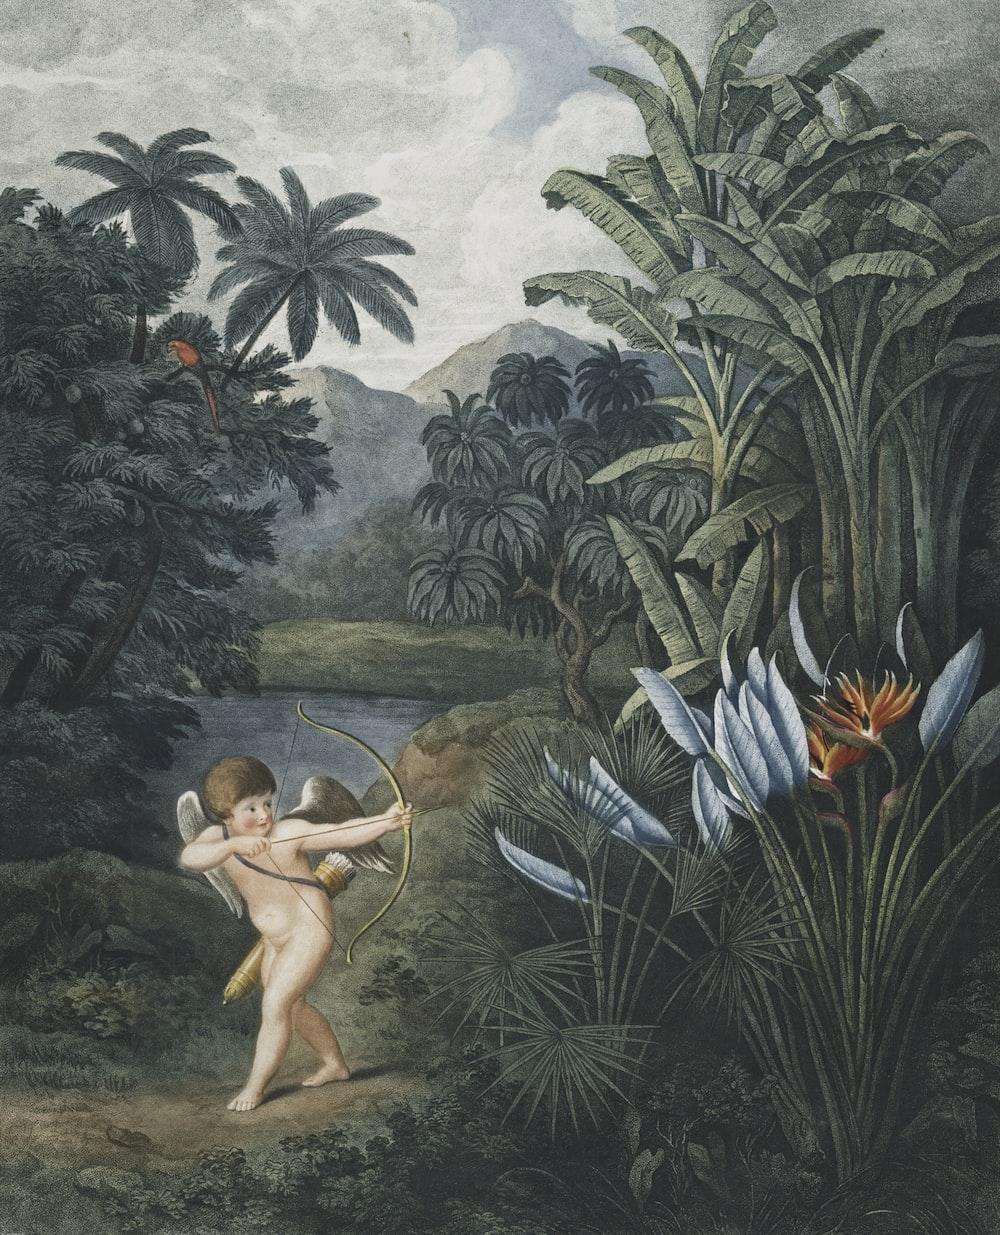 cherub holding bow and arrow near orange petaled flower painting